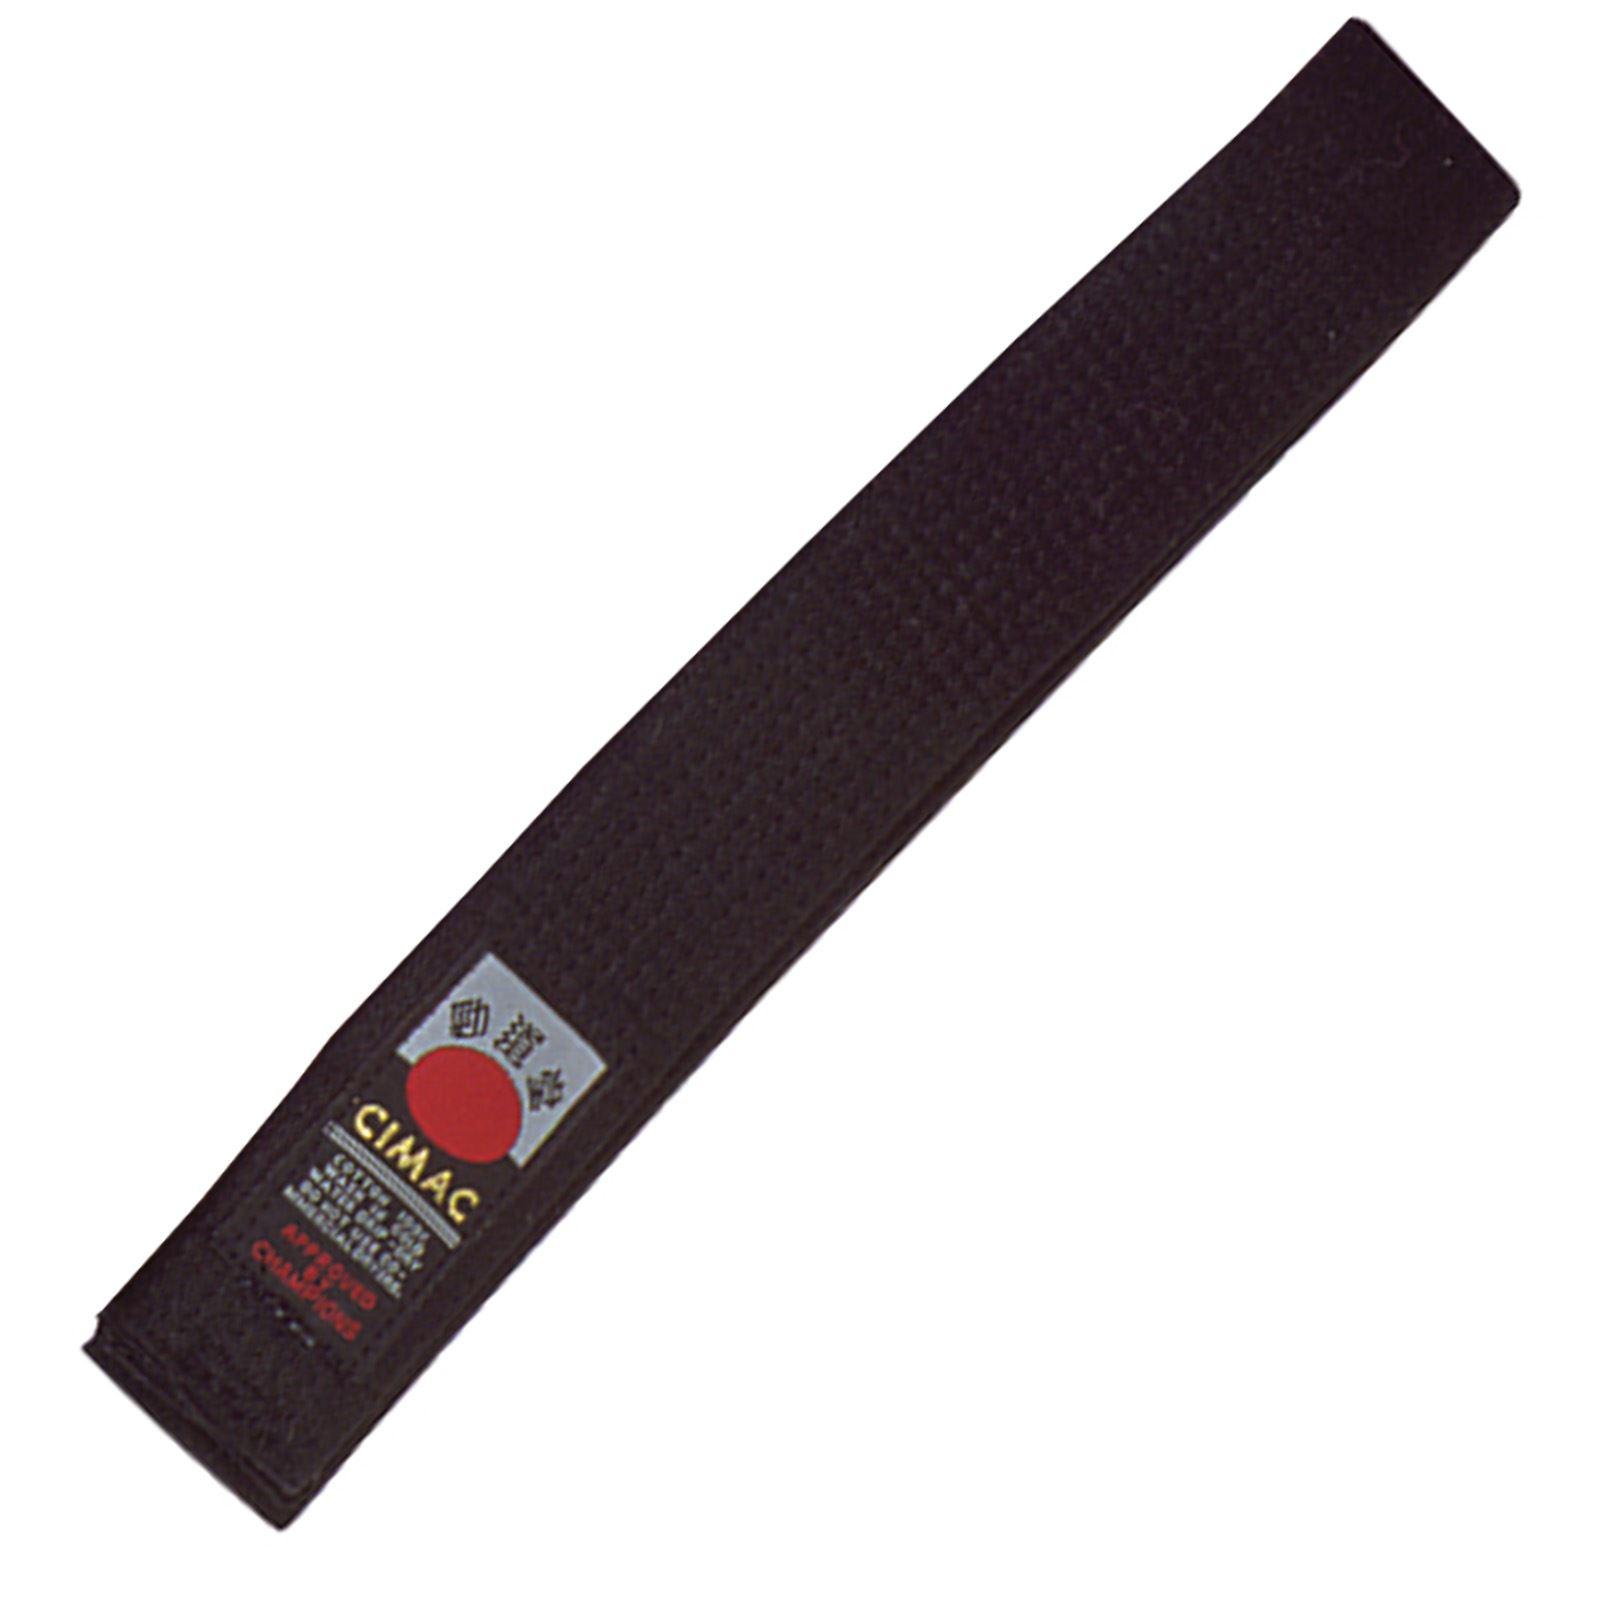 Cimac-Judo-Karate-Taekwondo-Plain-Coloured-Martial-Arts-Belt-UniformVarious-Size thumbnail 3